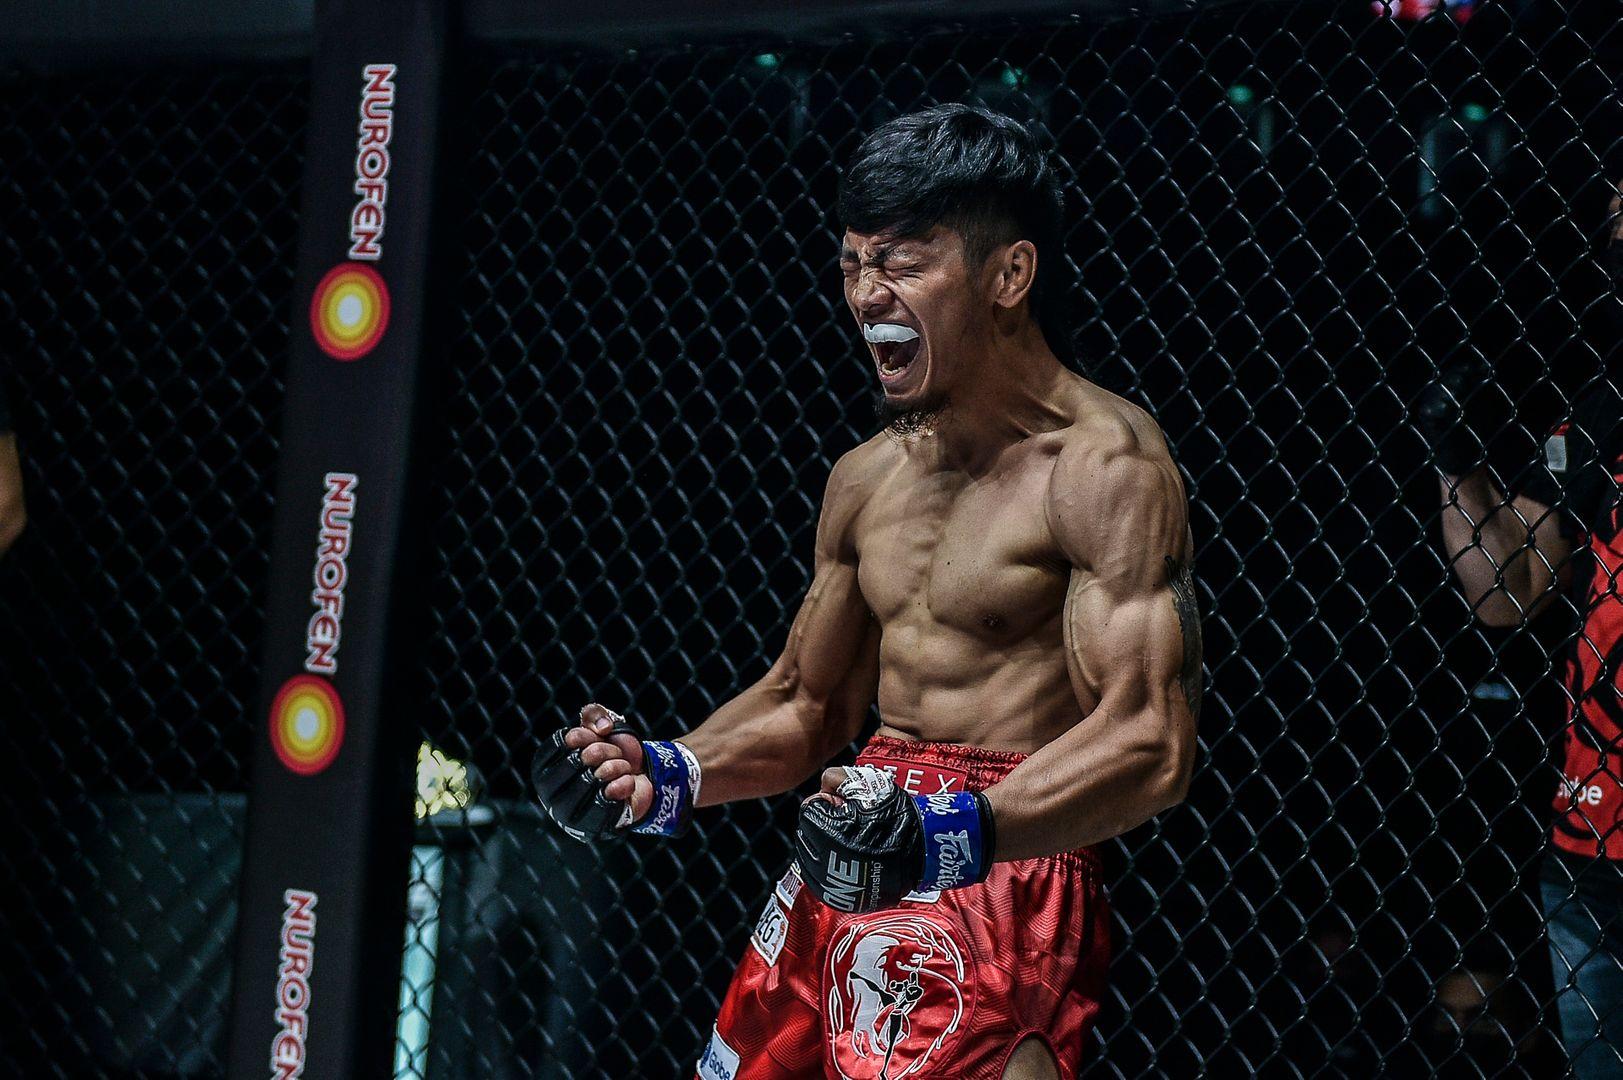 ONE-Inside-The-Matrix-Lito-Adiwang Adiwang had to restart after COVID battle: 'Hindi lang back to zero, negative pa' Mixed Martial Arts News ONE Championship  - philippine sports news